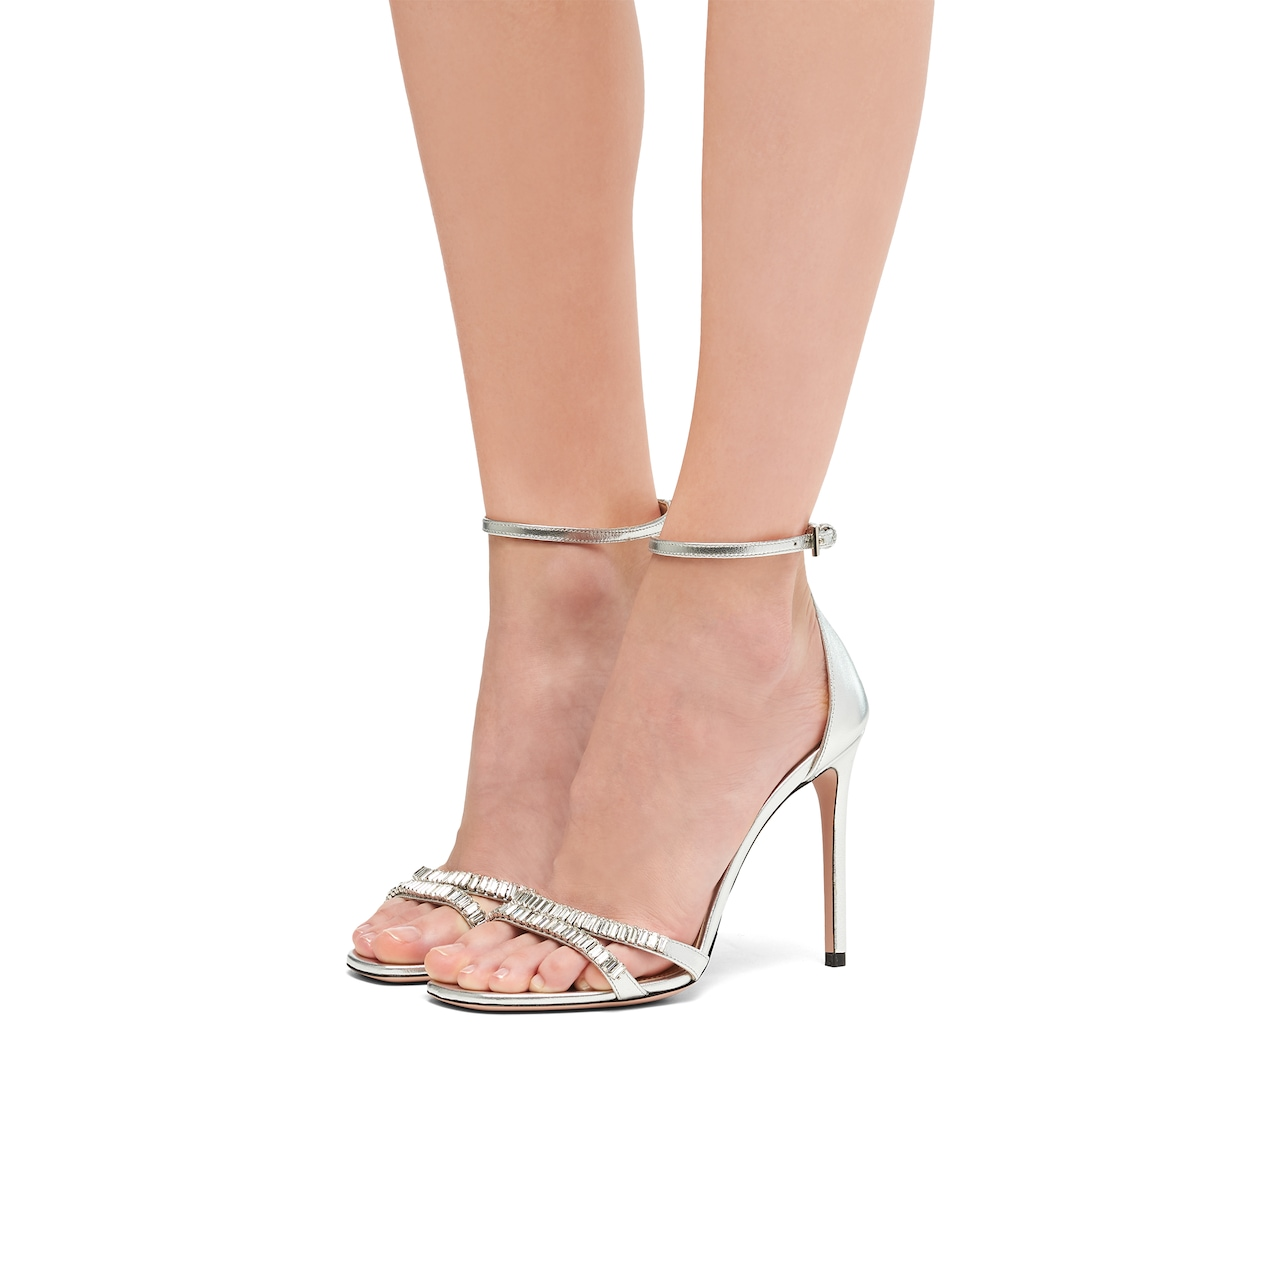 Prada Laminated nappa leather sandals 3